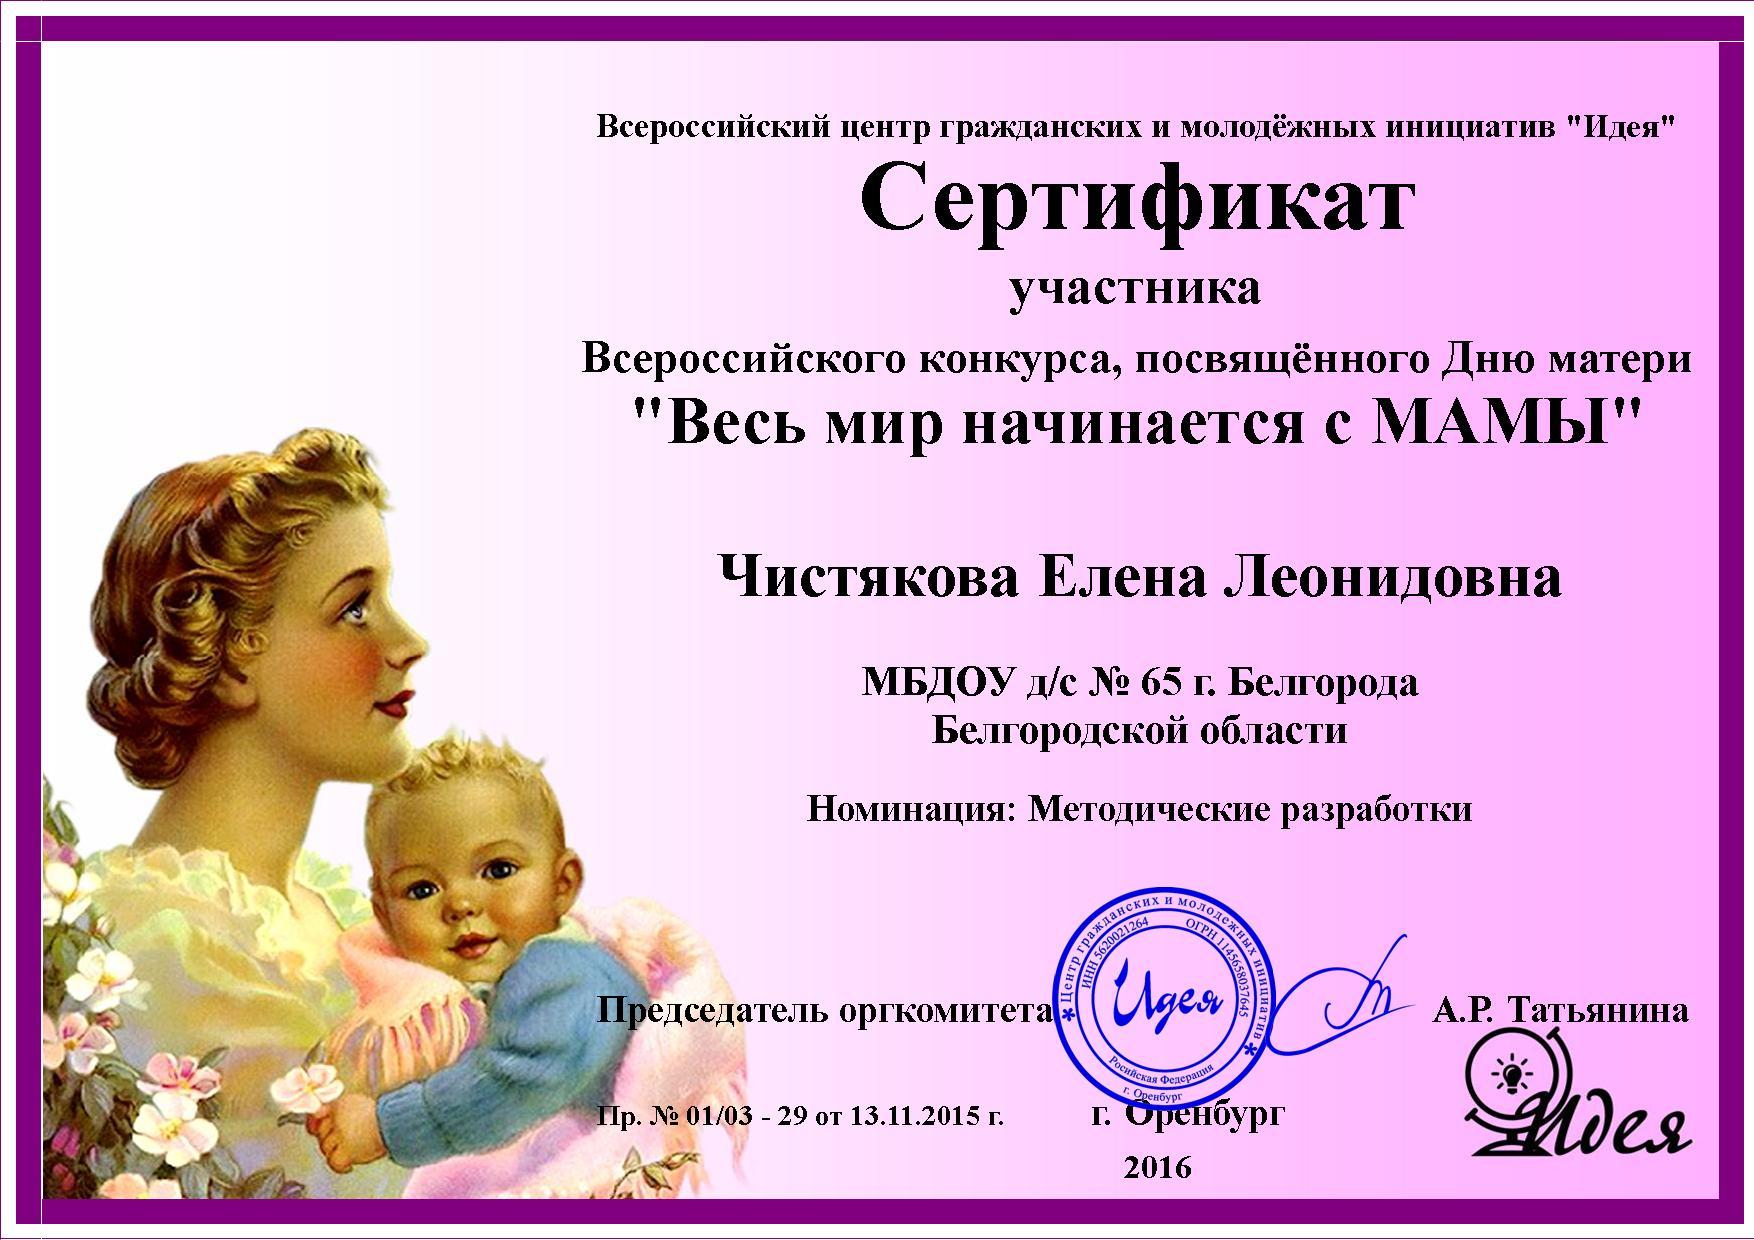 Сертификат-31057-Чистякова Елена Леонидовна